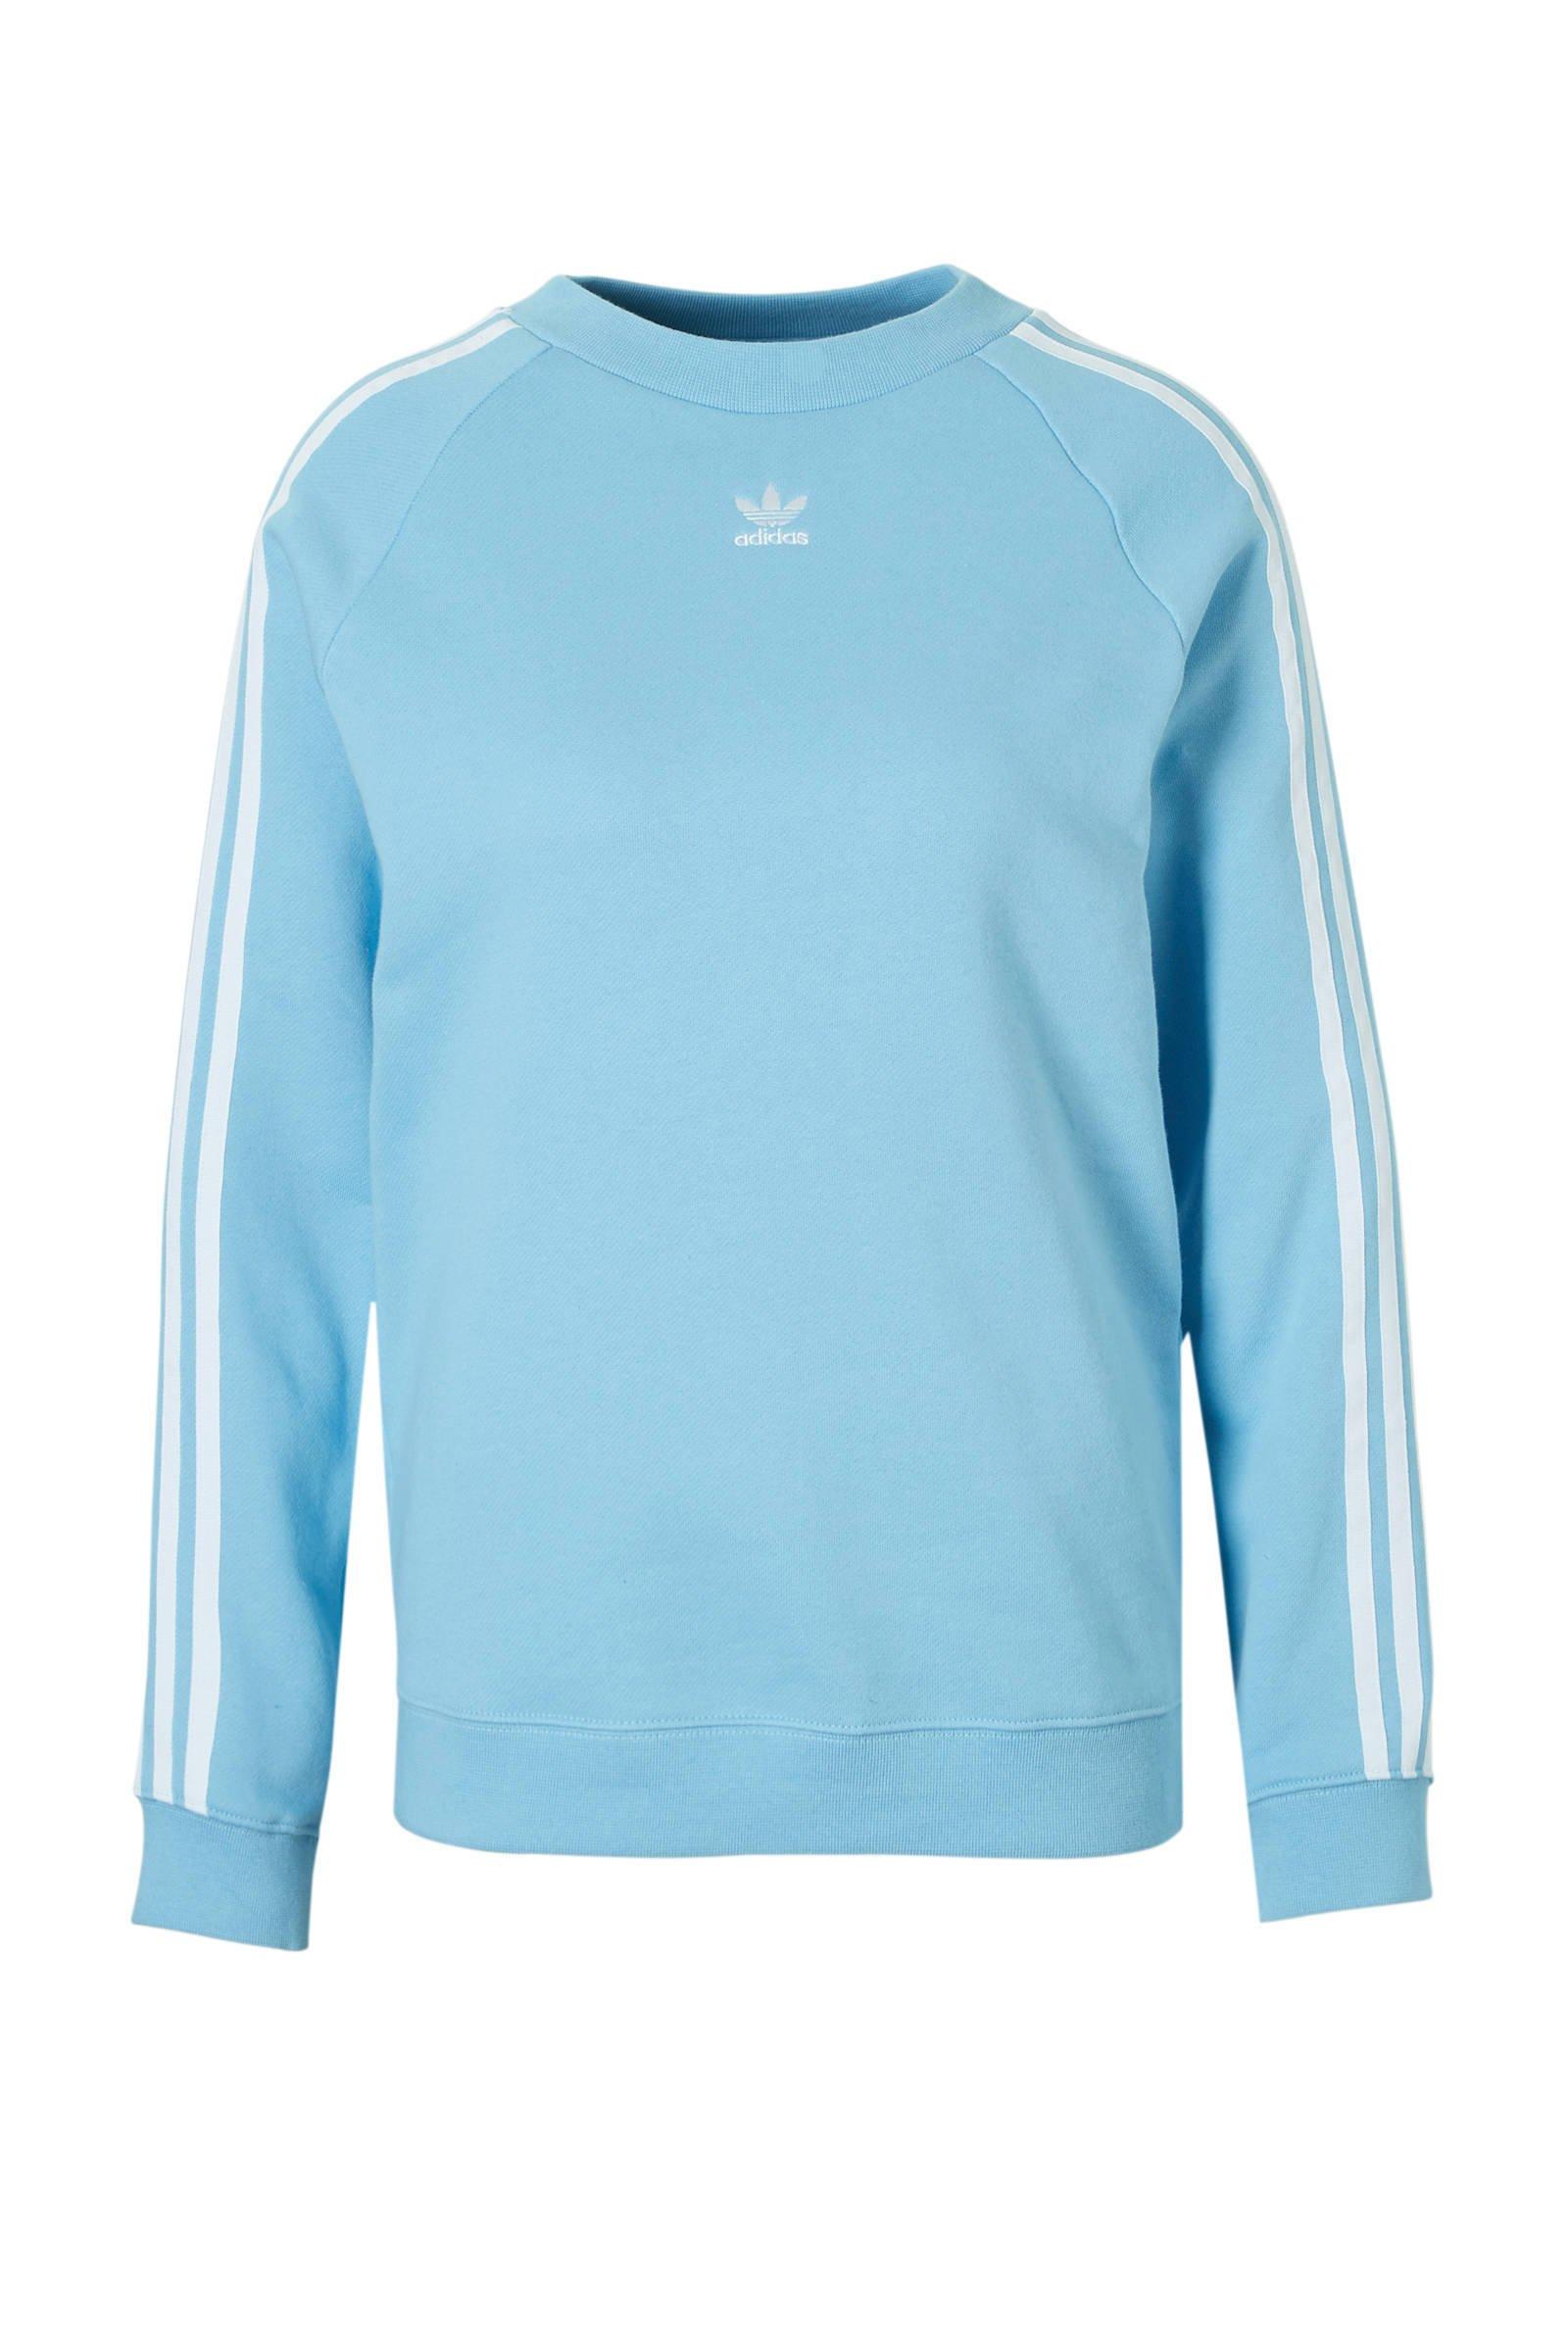 adidas Originals sweater blauw | wehkamp